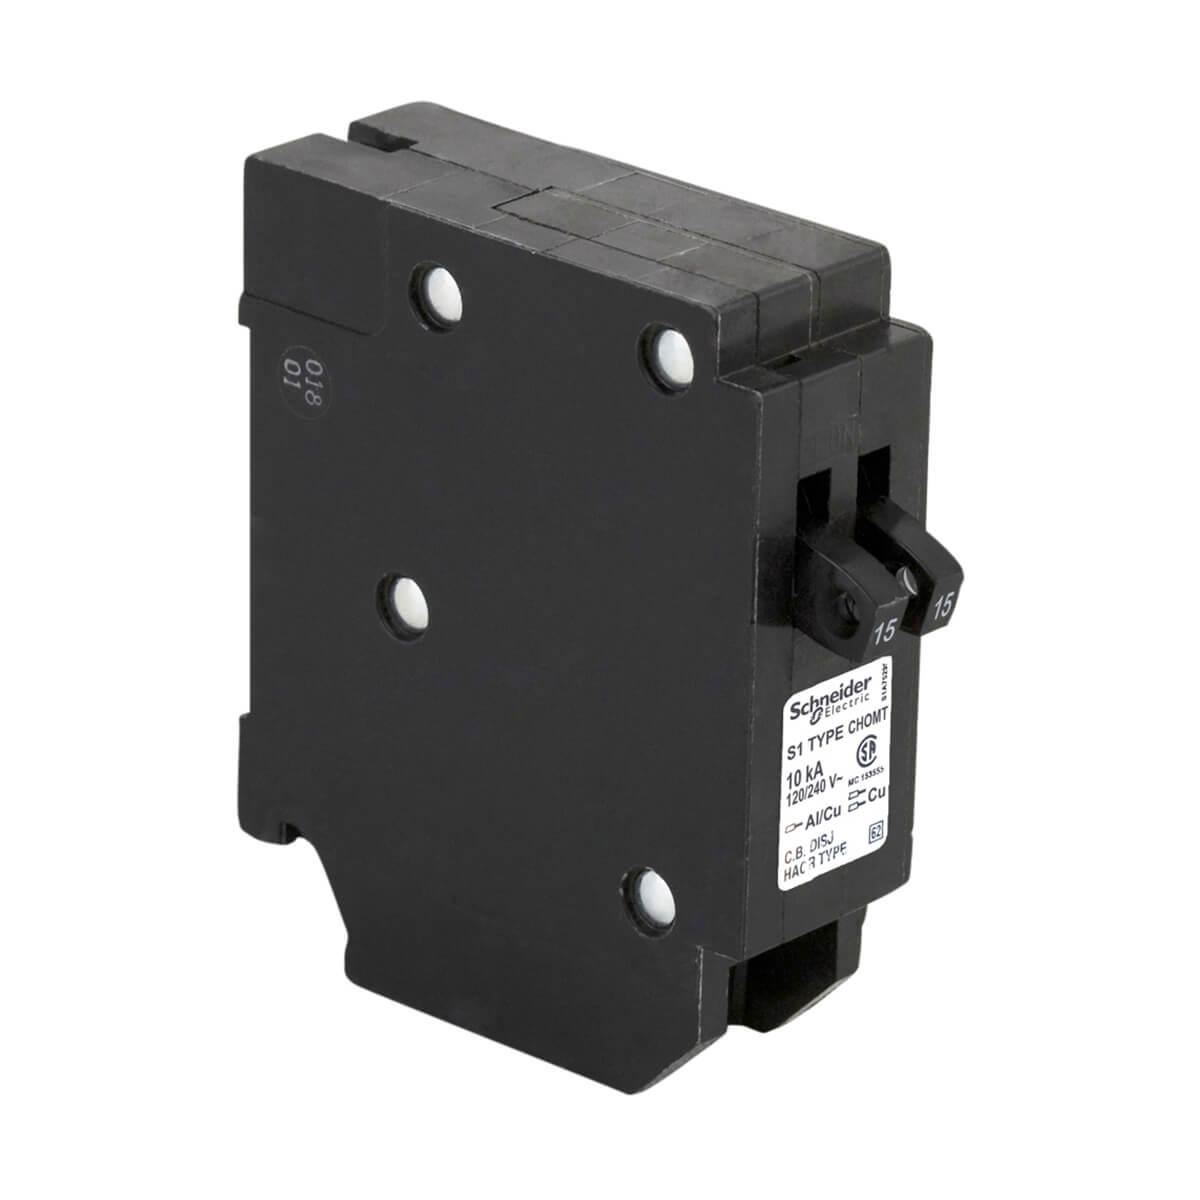 Schneider Electric Single Pole 15-15 Amp HomeLine Tandem Plug-On Circuit Breaker